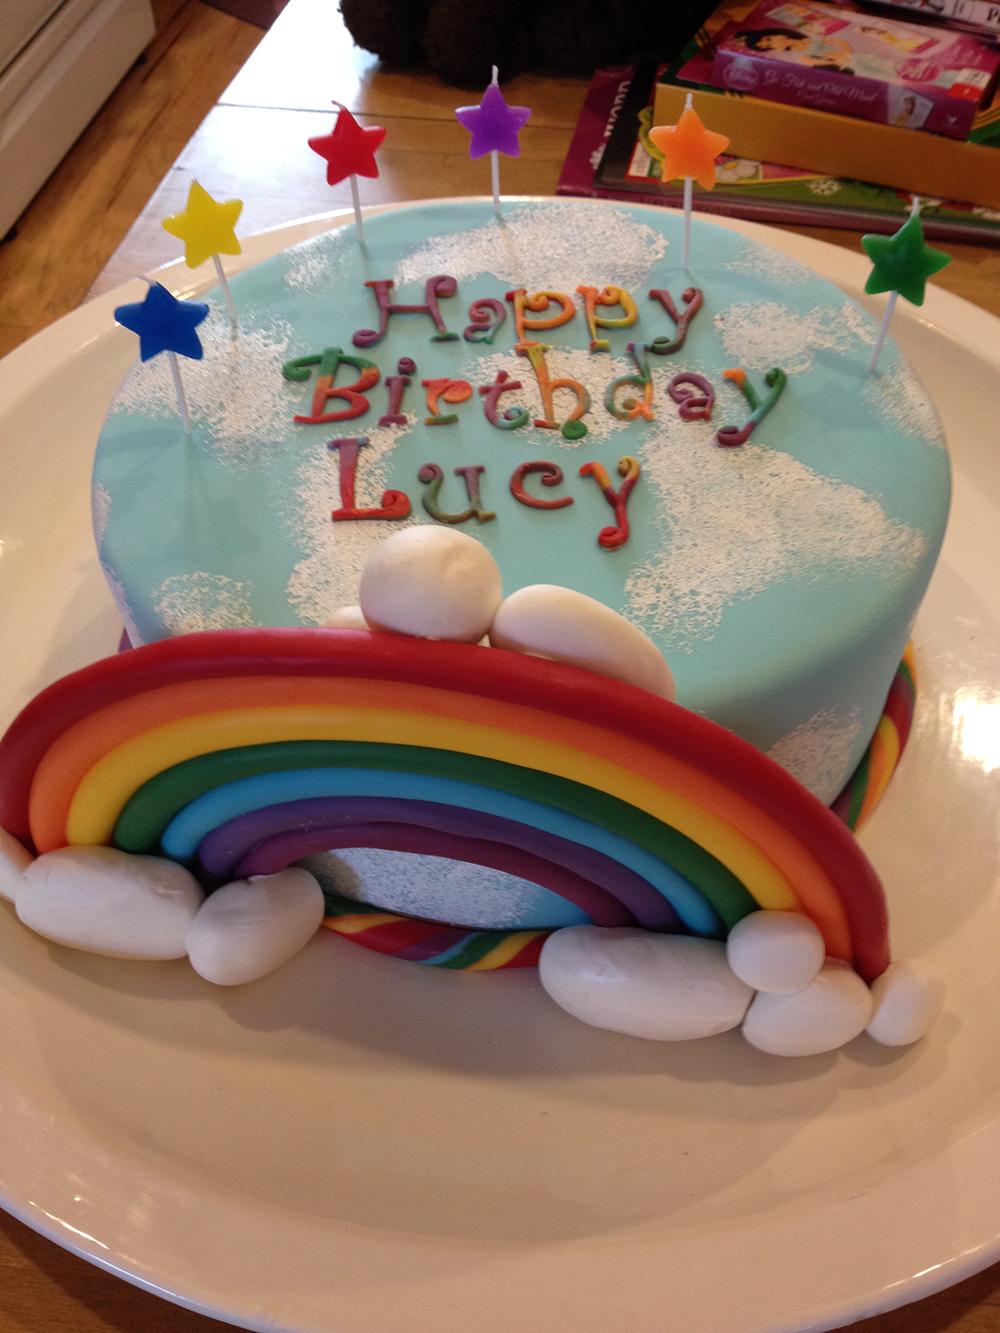 lucy cake.JPG